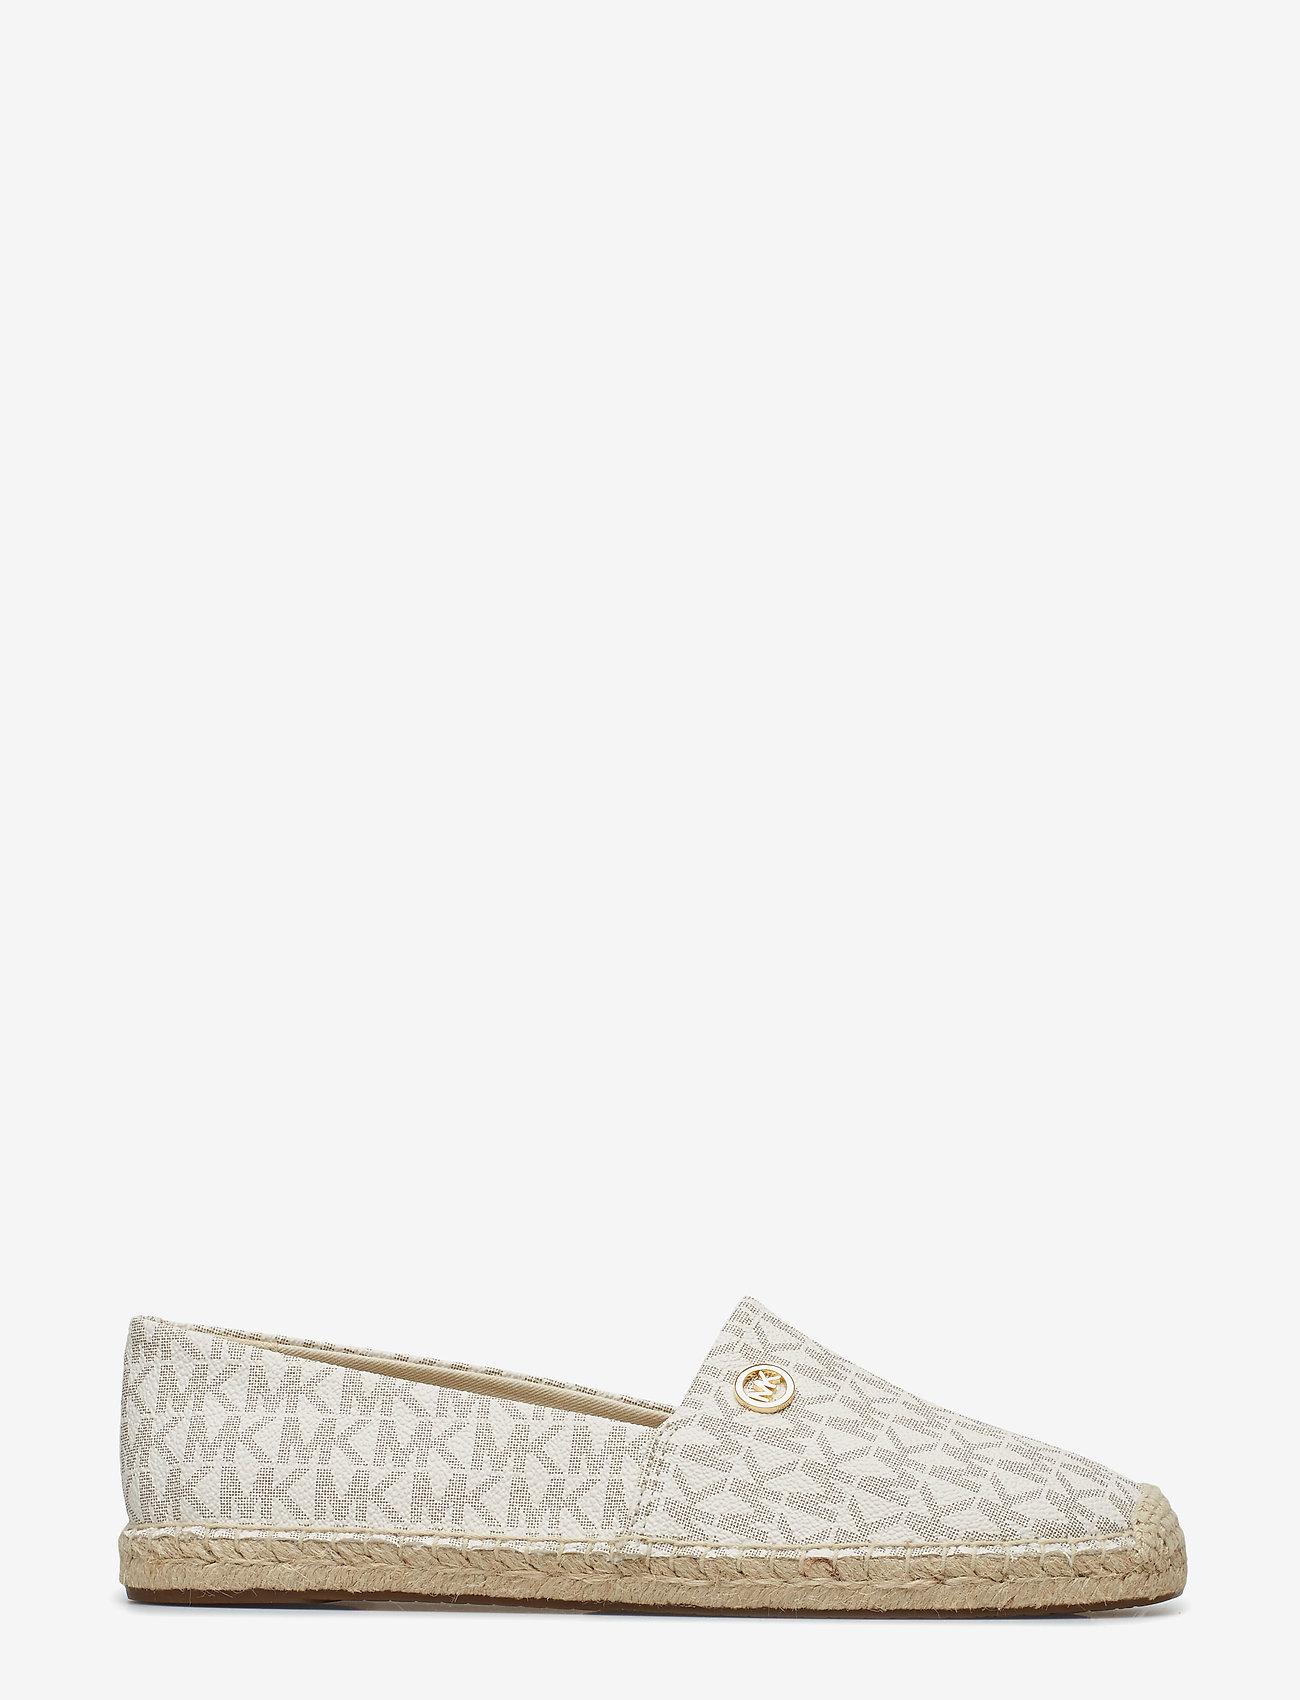 Michael Kors Shoes - KENDRICK SLIP ON - matalat - vanilla